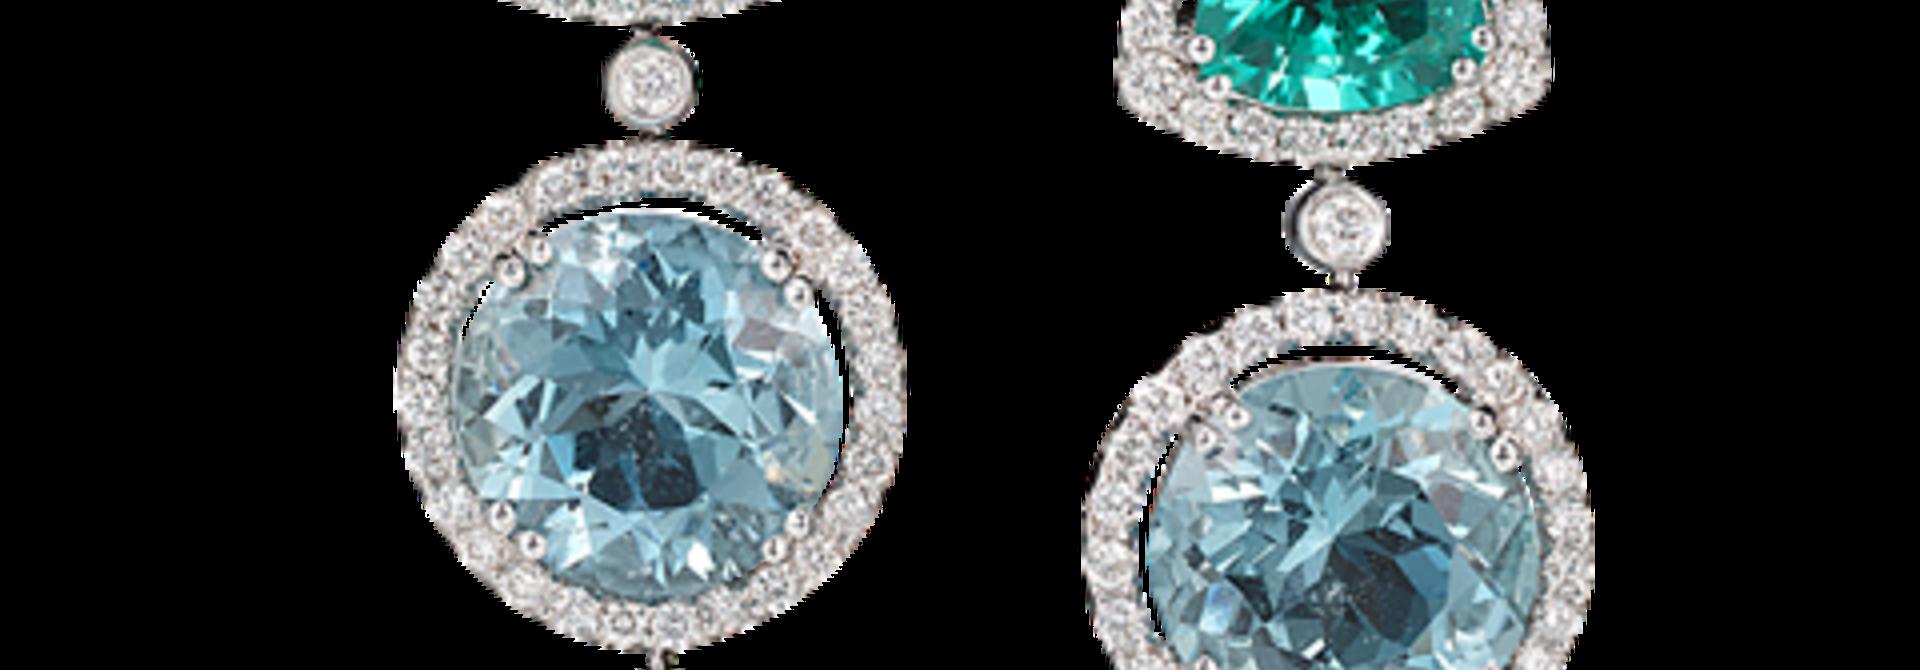 Diamond, Blue-Green Tourmaline, Aquamarine & South Sea Pearl Earrings